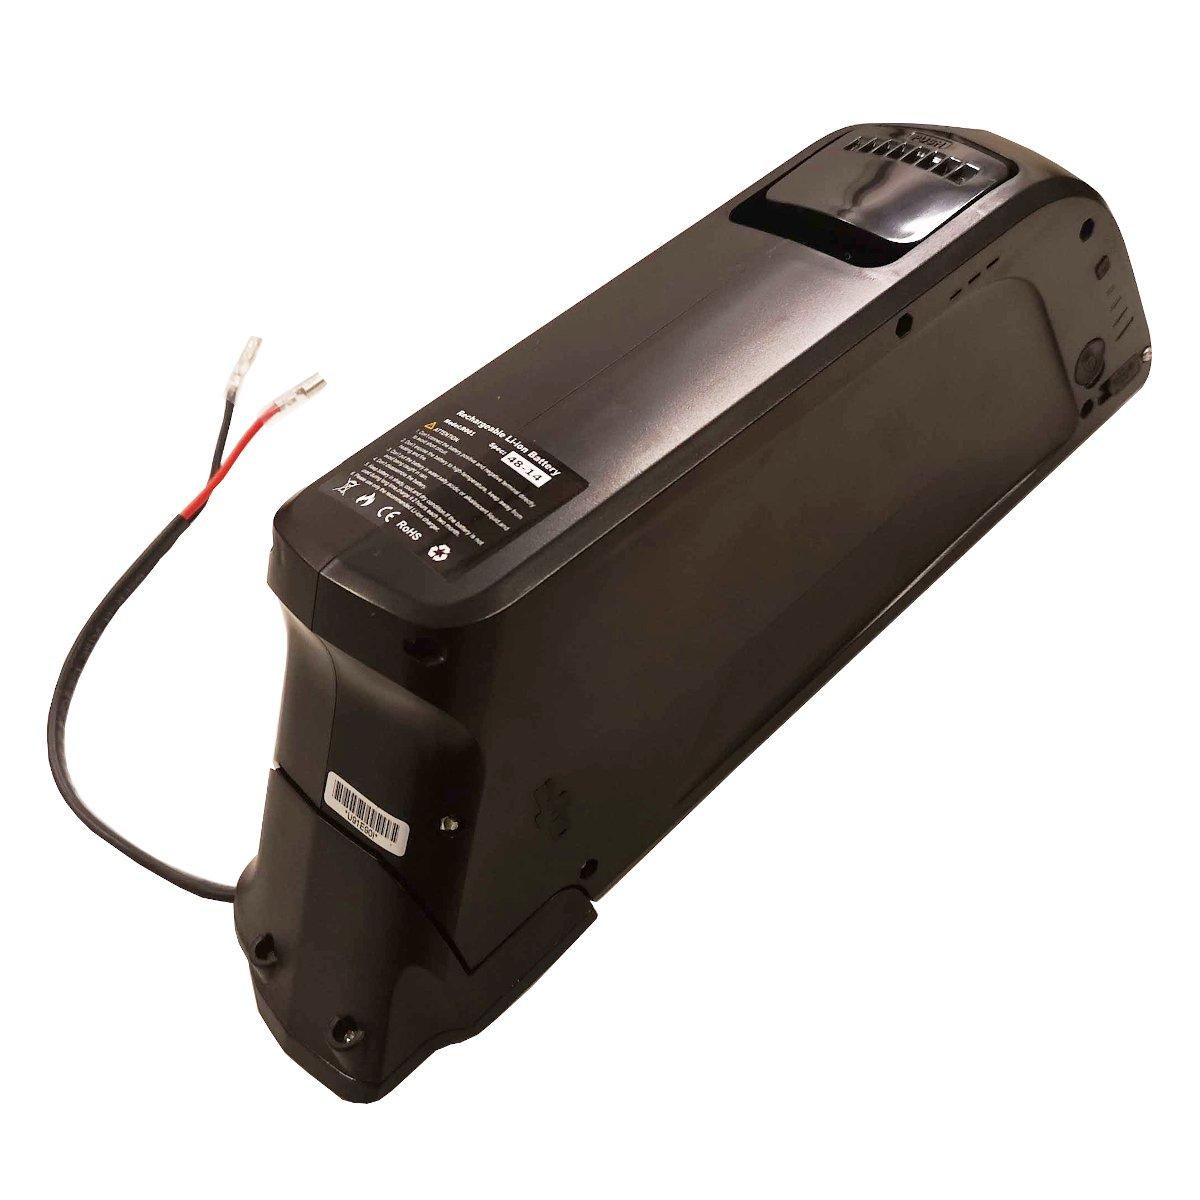 Rambatteri, 36V, 10,4Ah375Wh Dolphin